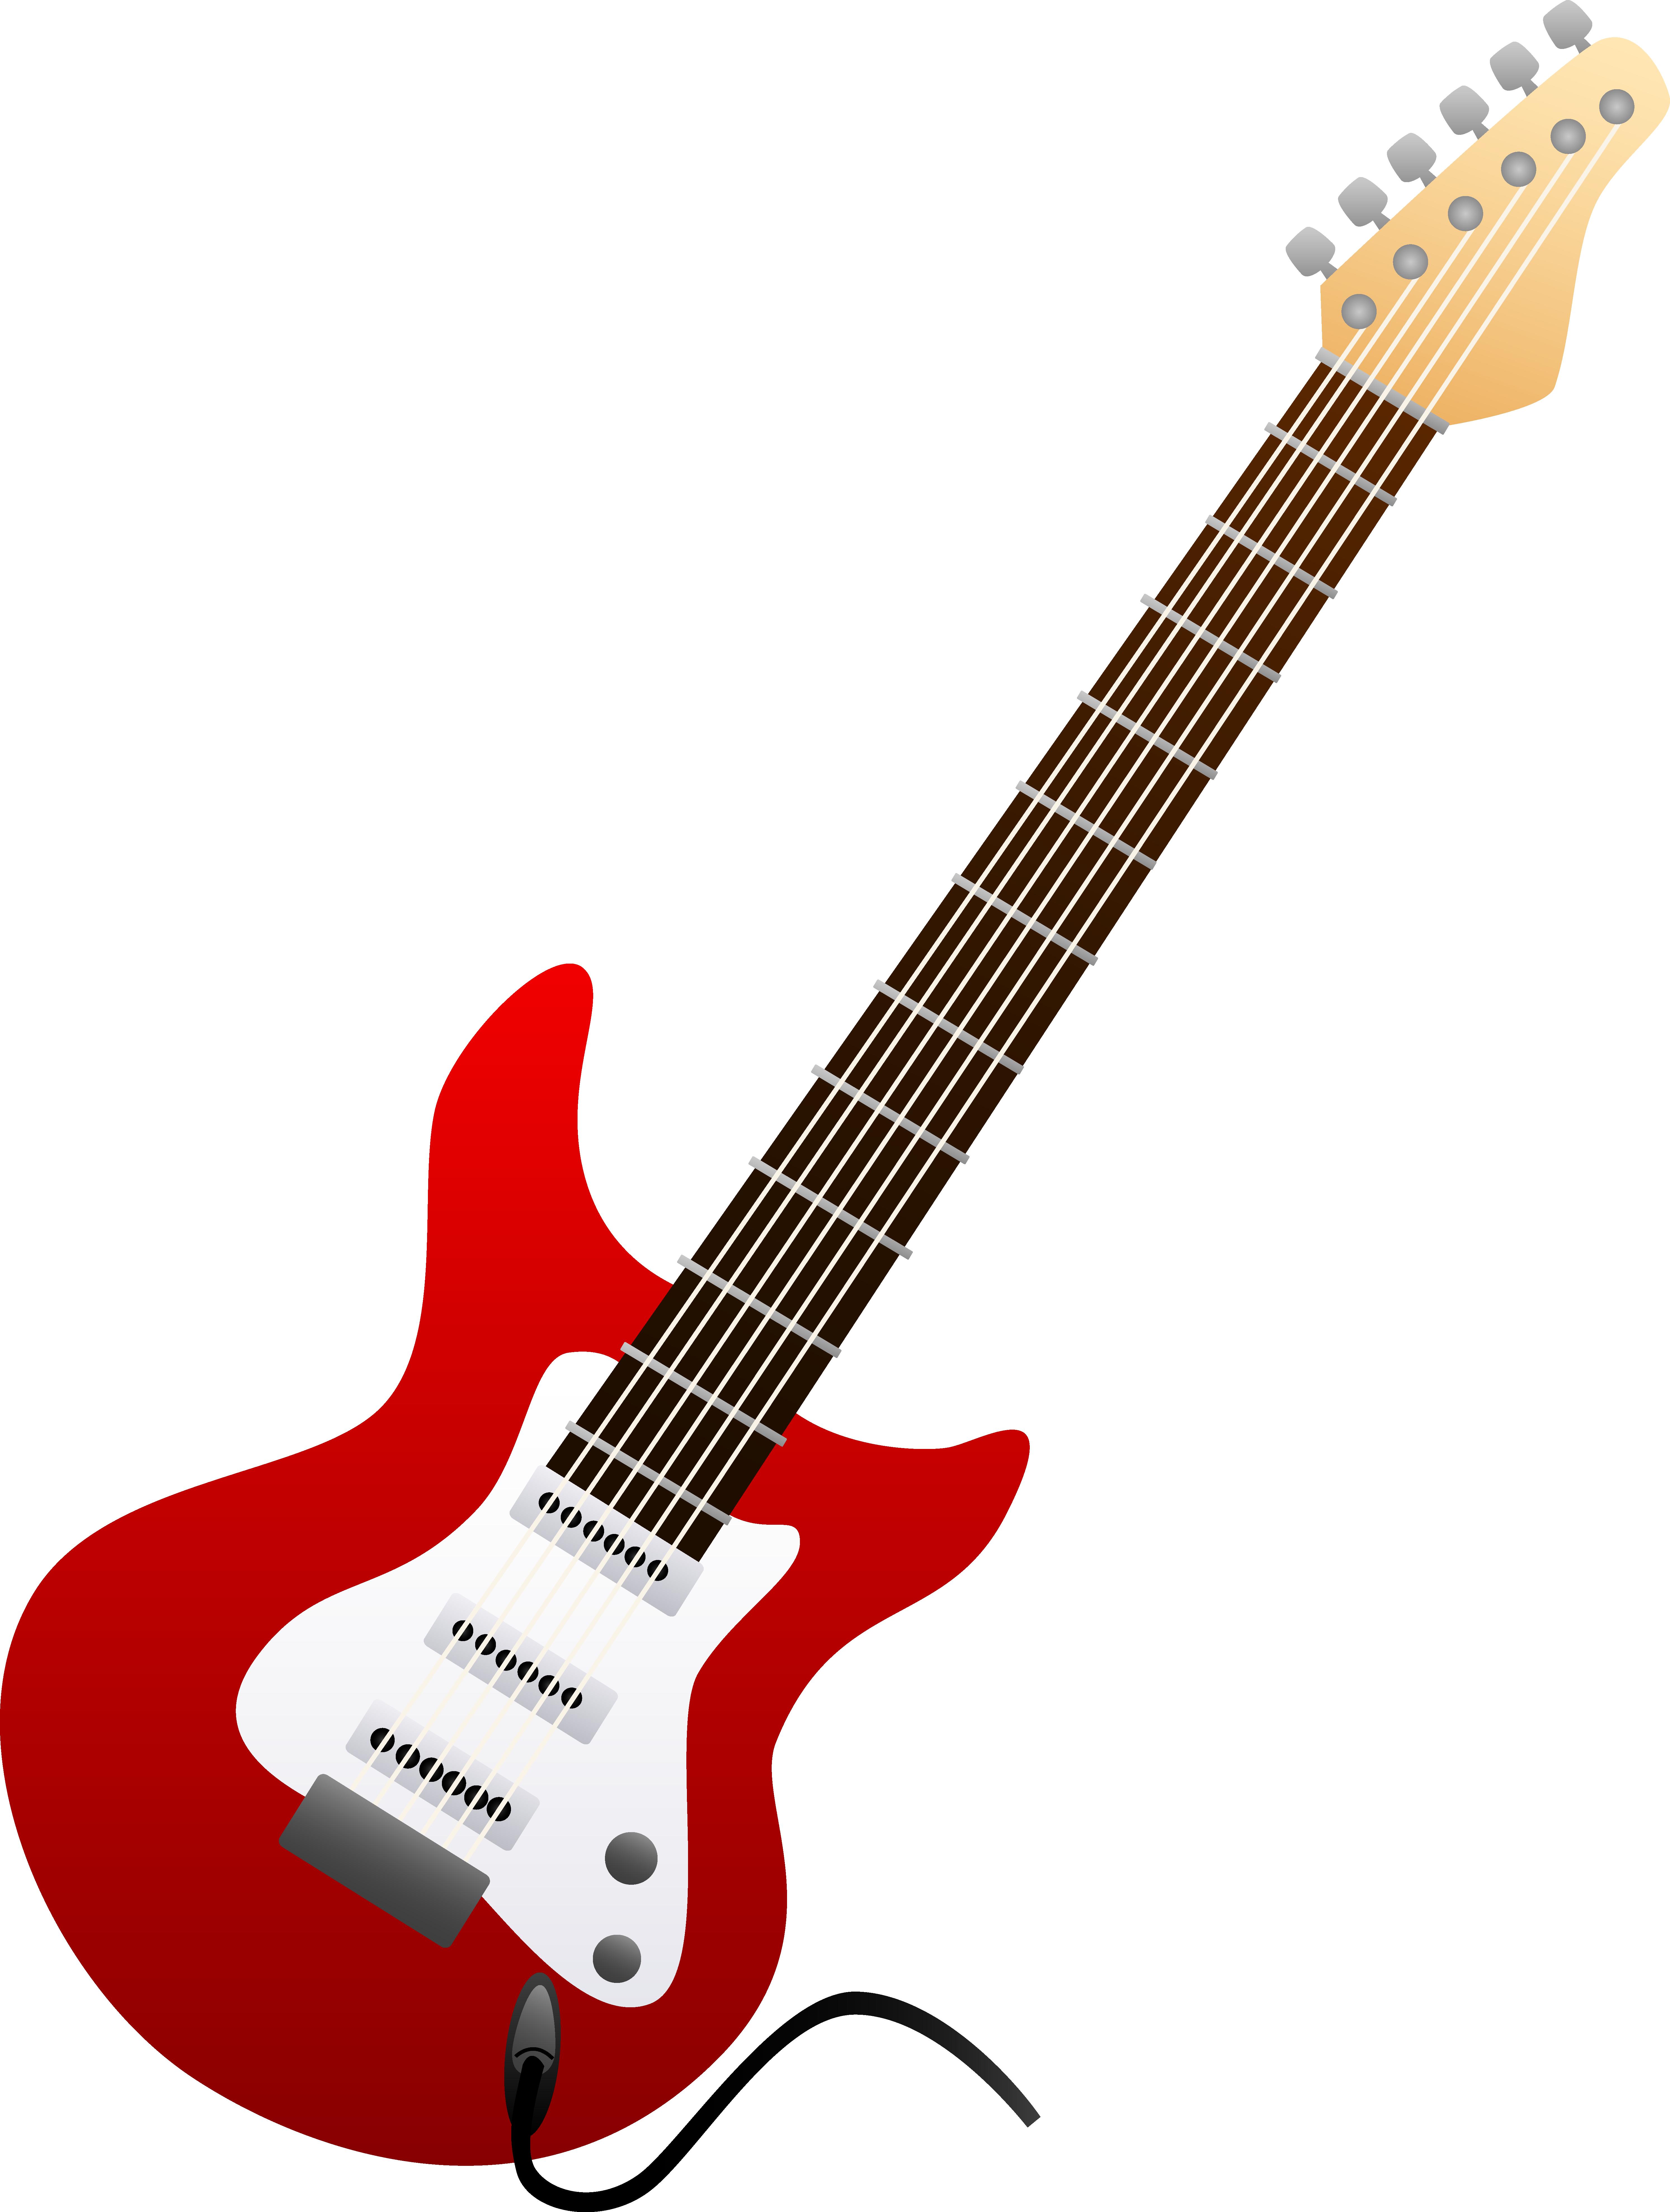 5971x7908 42 Guitar Clip Art. Clipart Panda